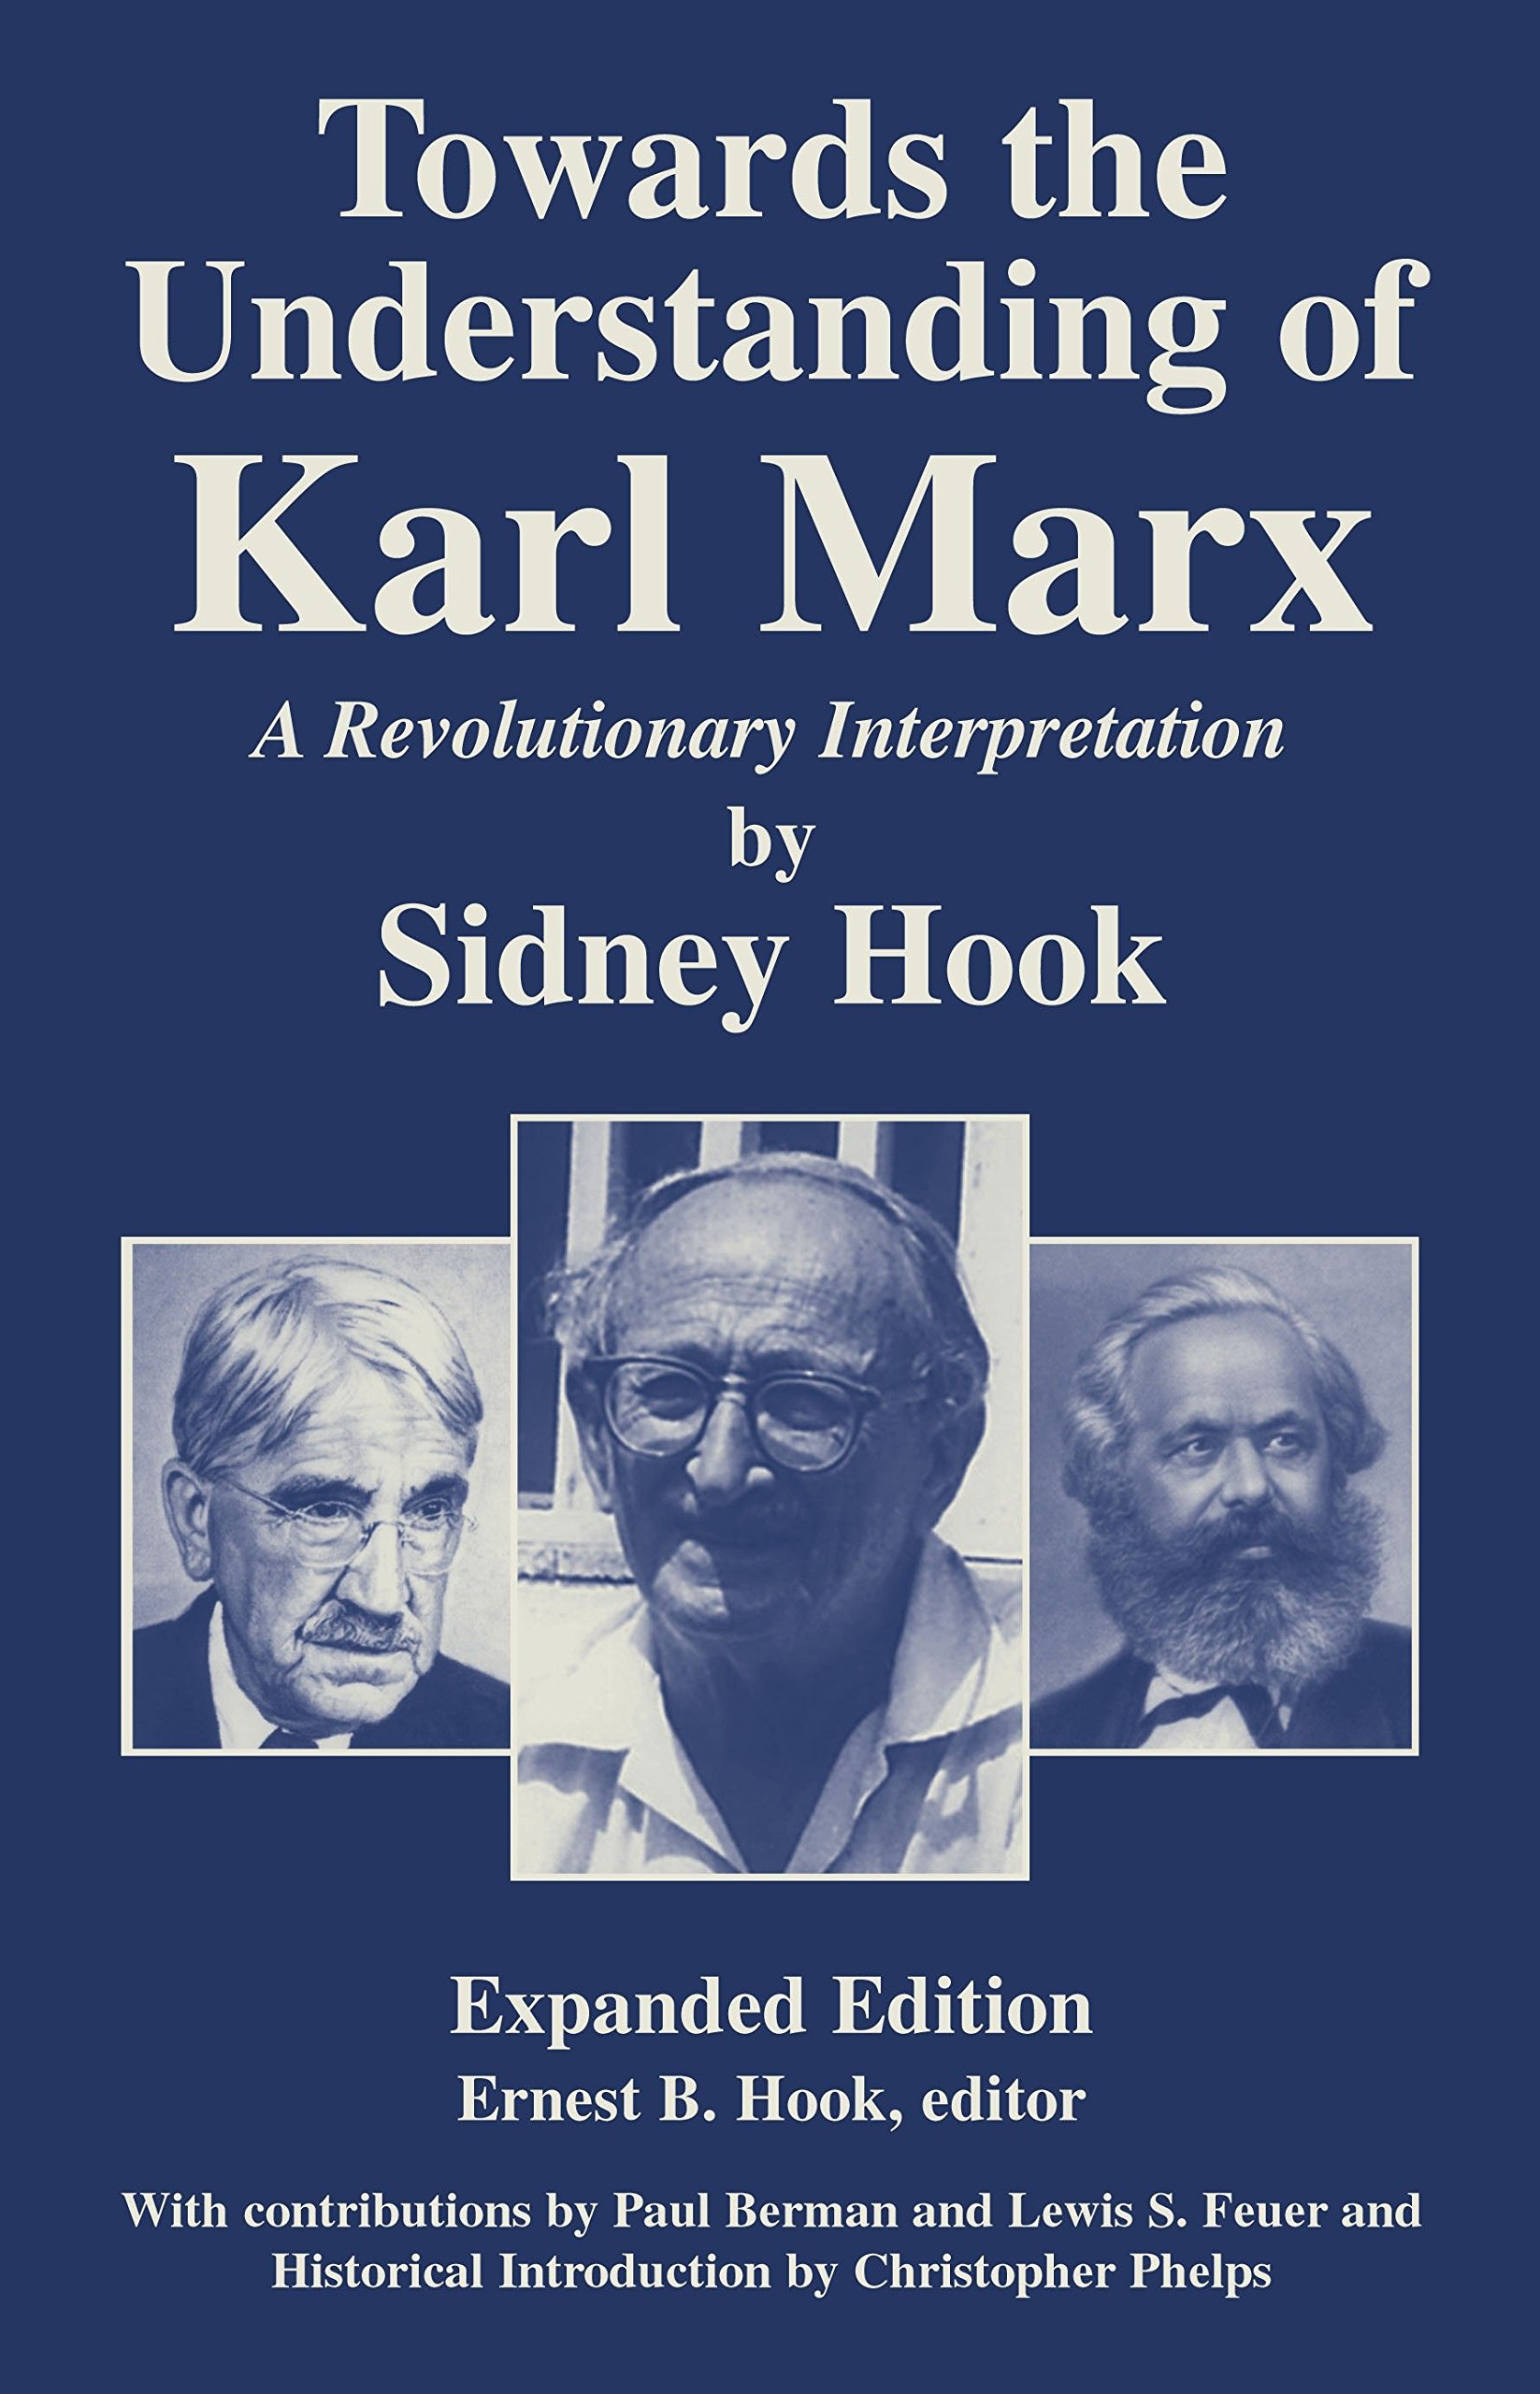 Download Towards the  Understanding of Karl Marx: A Revolutionary Interpretation ebook